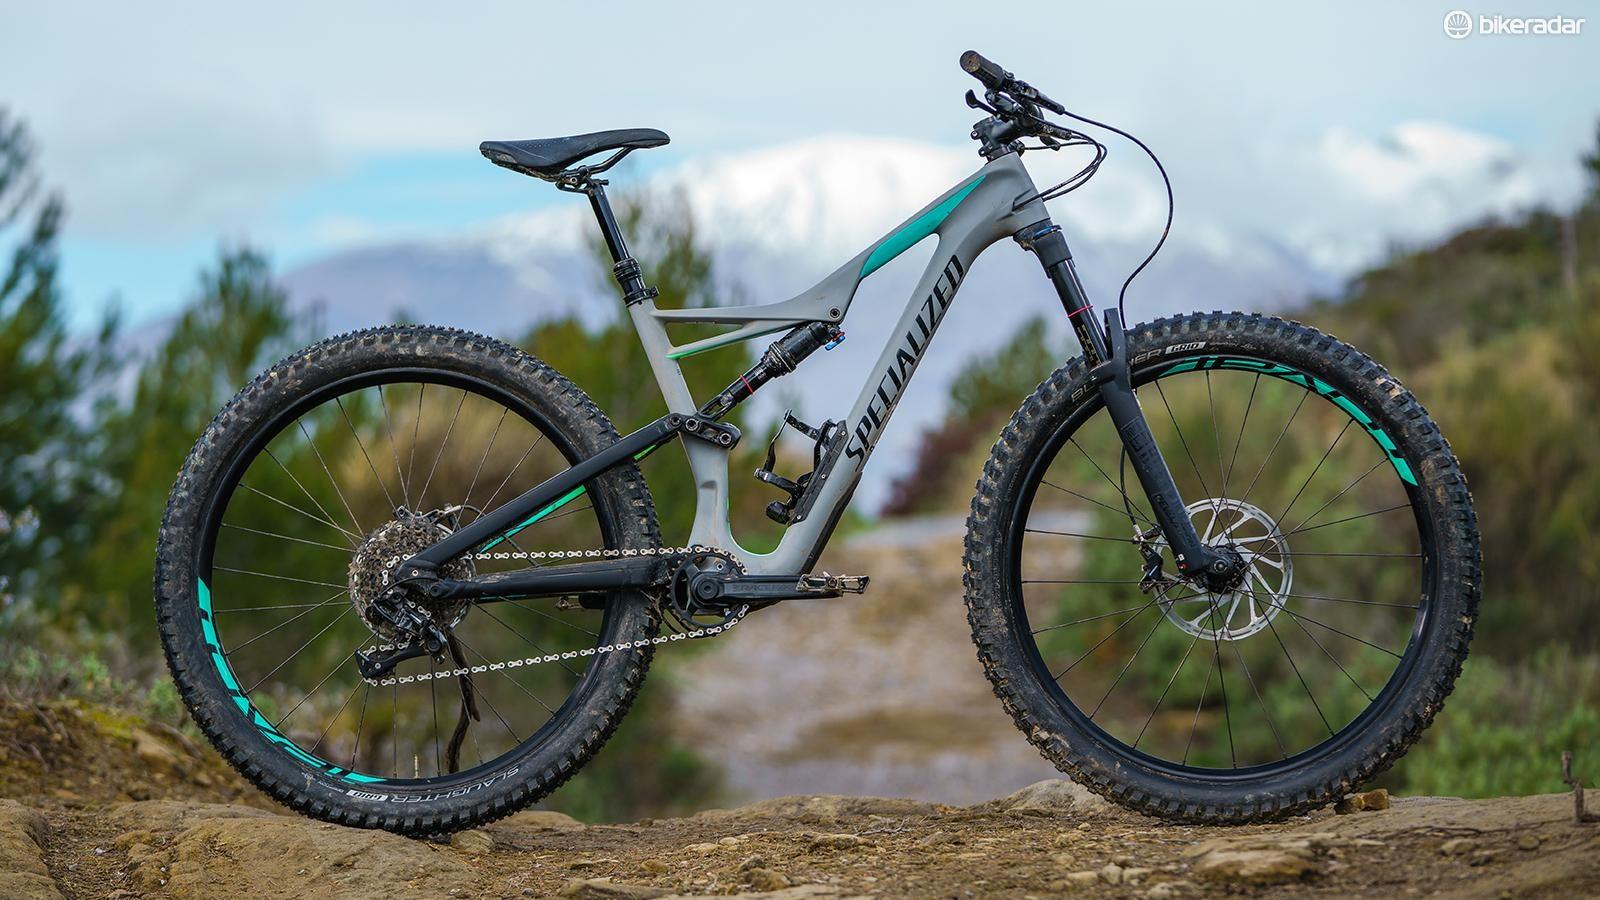 Aoile Mountain Bike Hydraulic Brake Oil Brake Aluminum Alloy Bikes Accessories